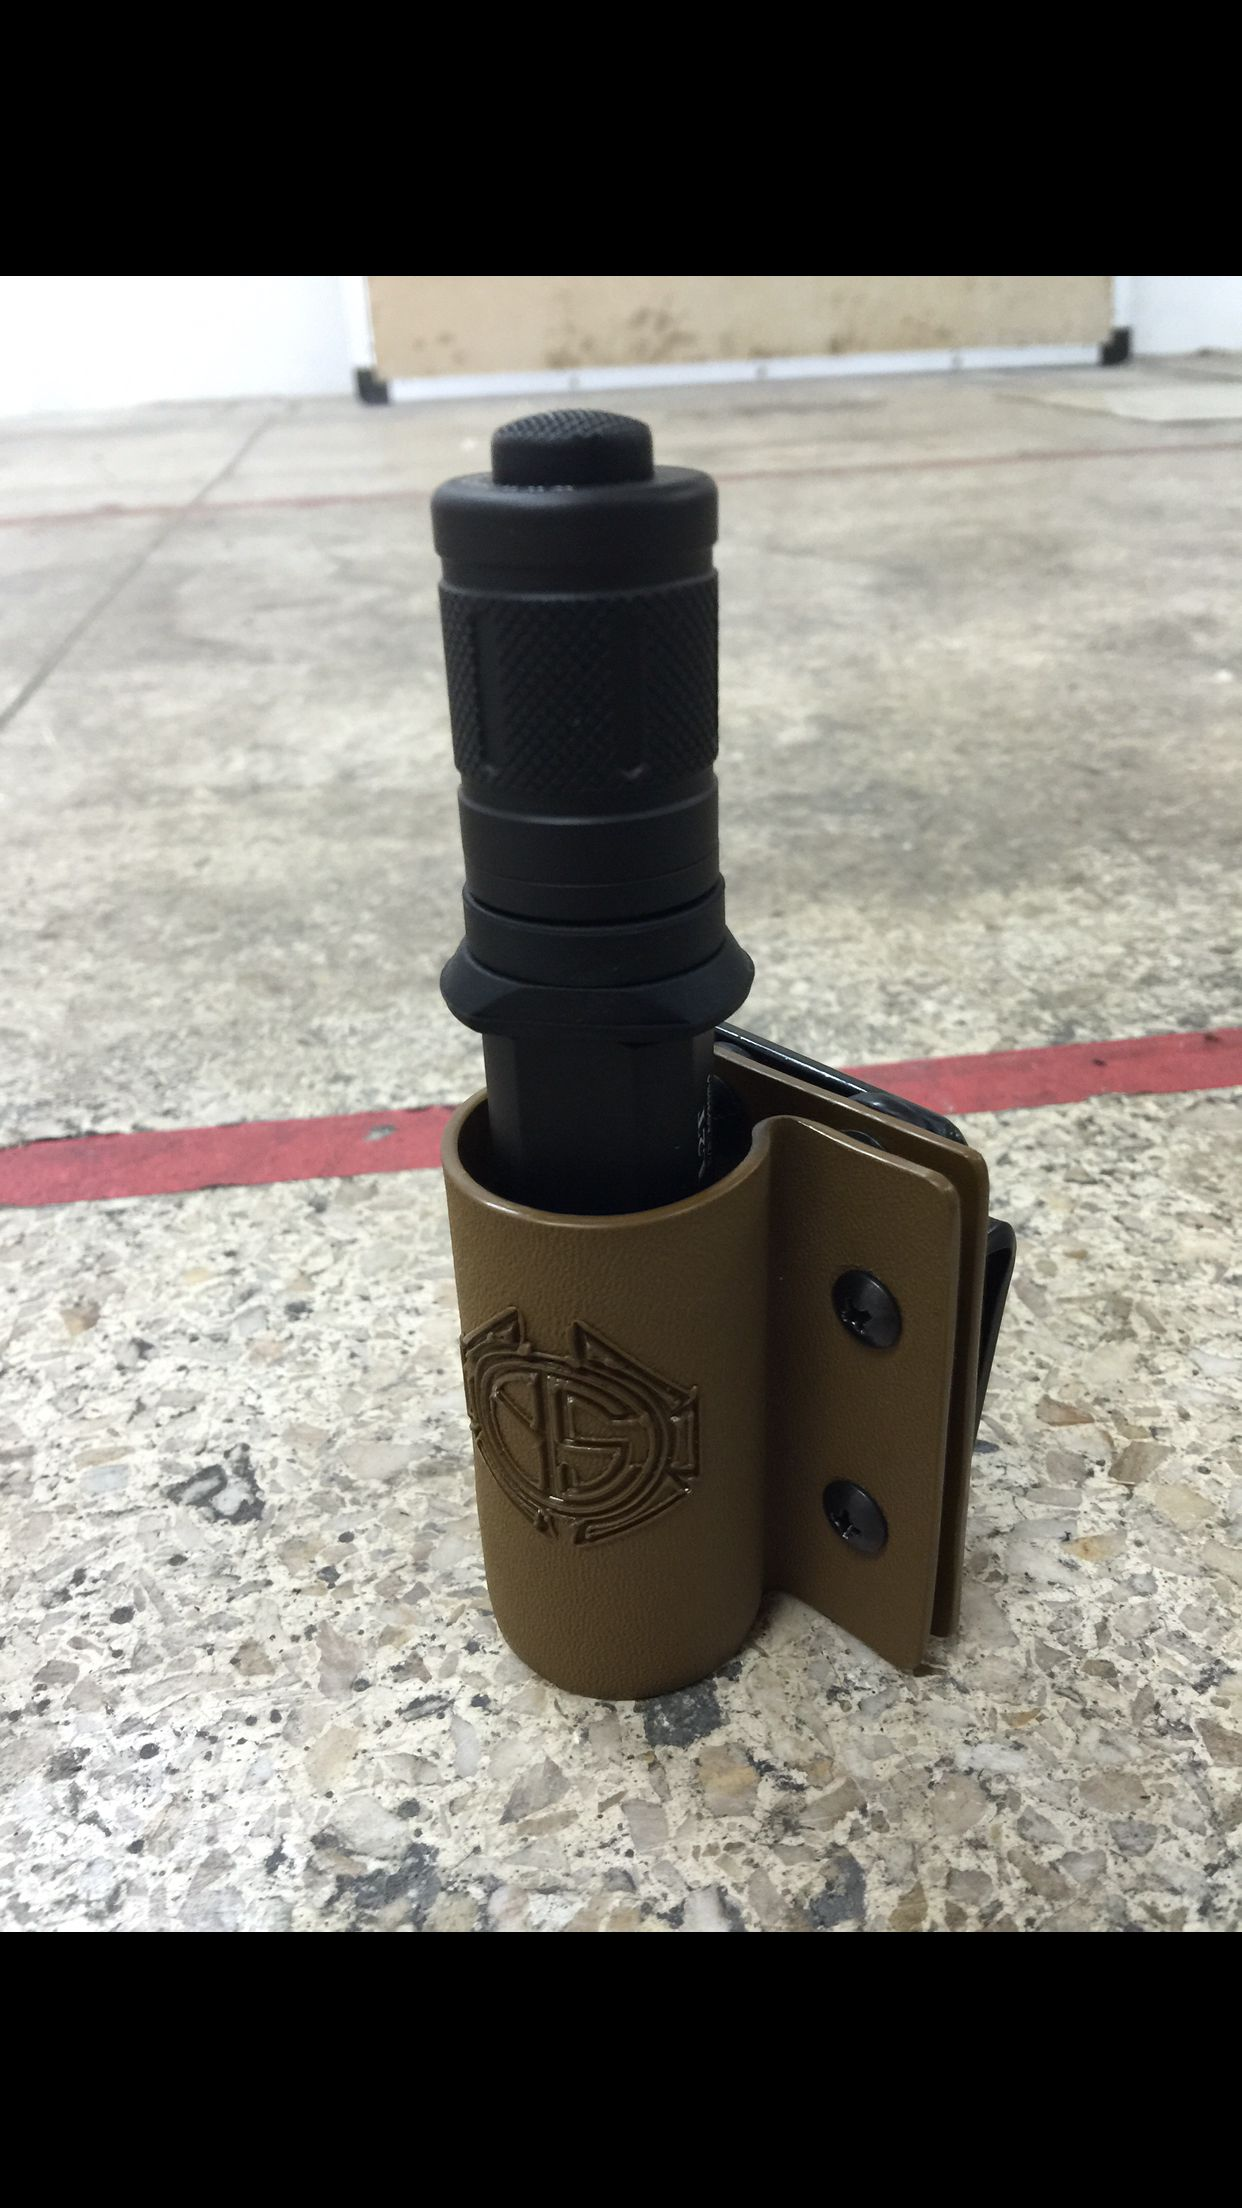 diy kydex holster supplies